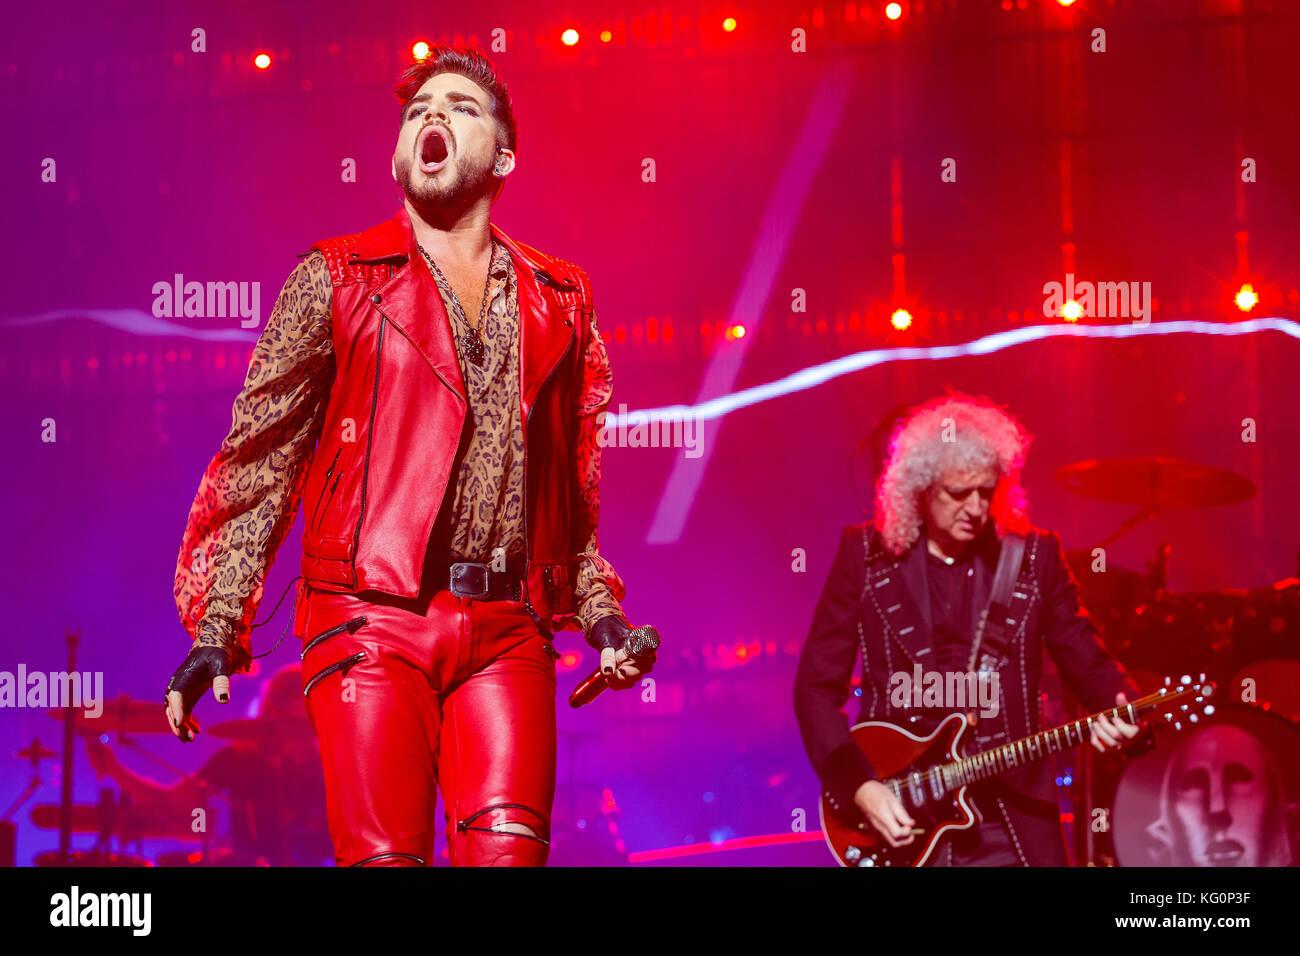 Singer Adam Lambert, left, and guitarist Brian May of British group Queen perform during the concert in Prague, - Stock Image